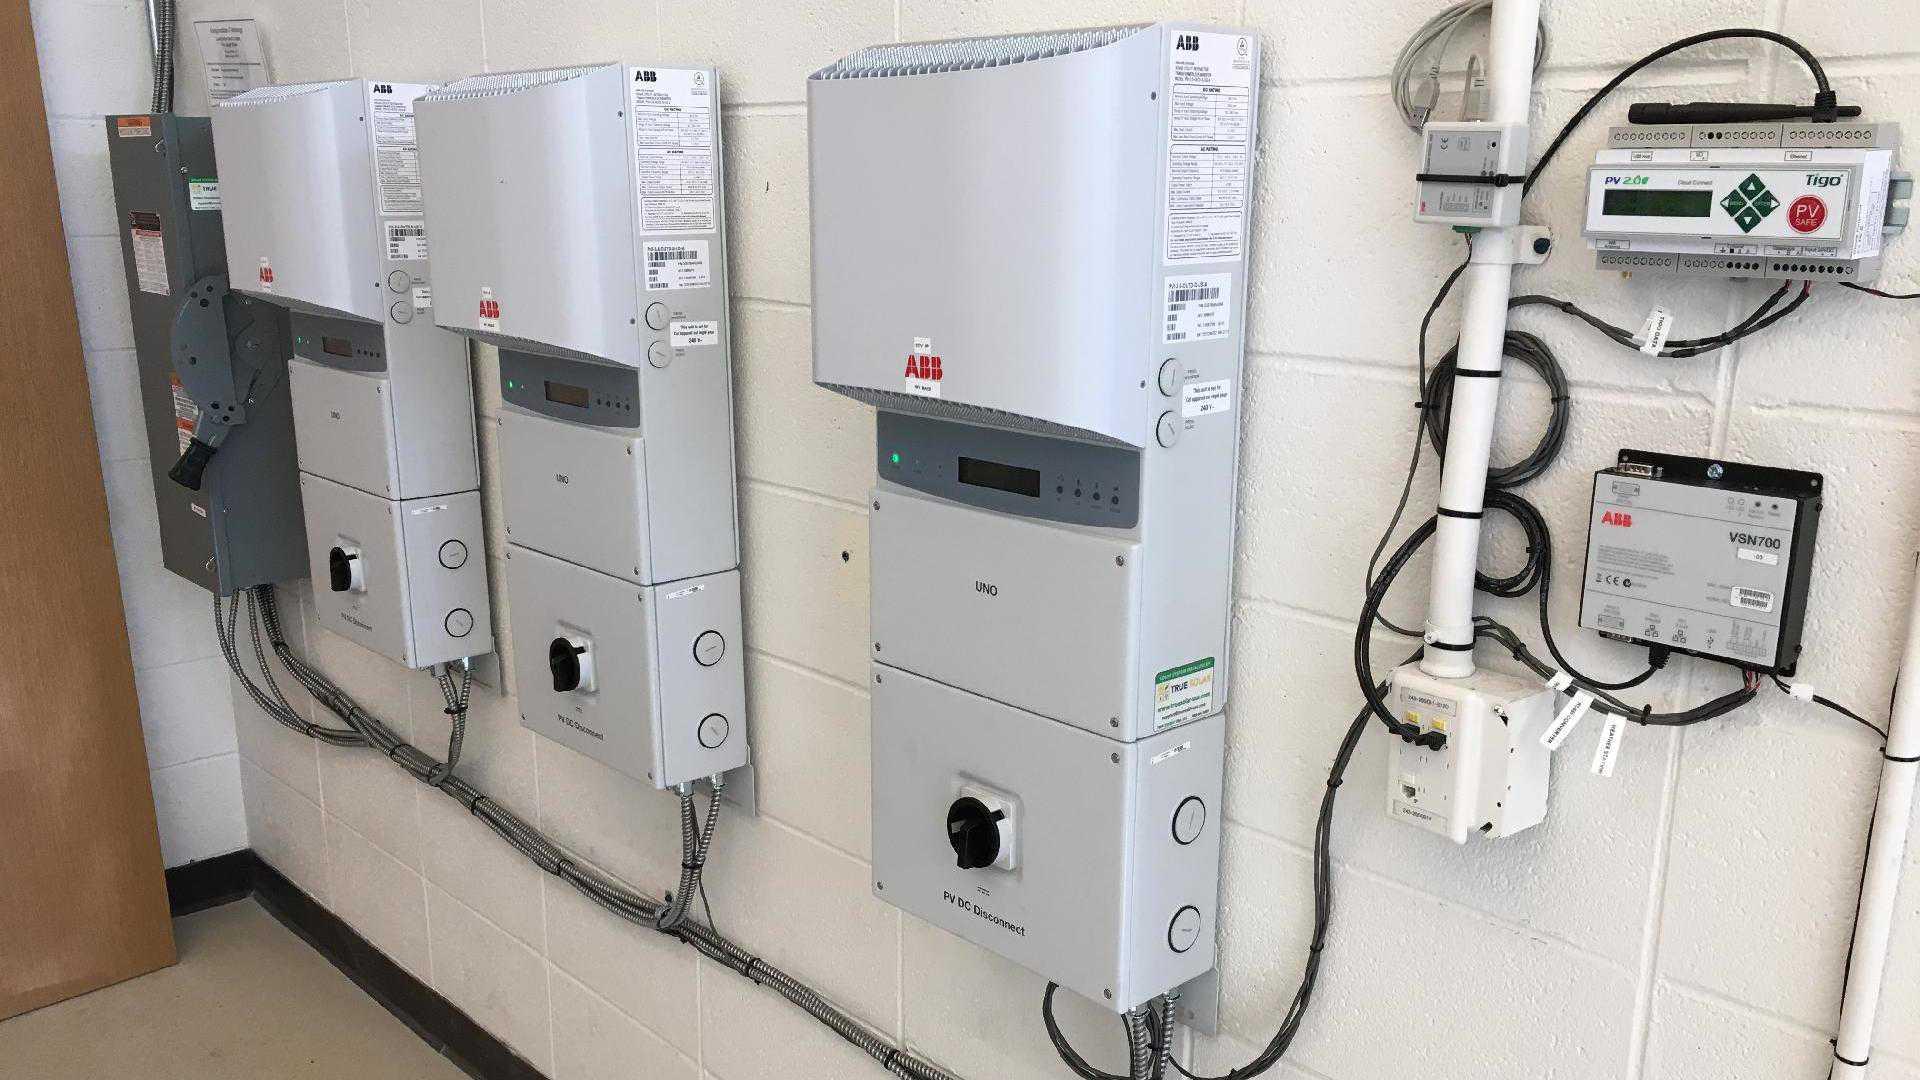 Georgia Tech Bunger Henry Solar Array Abb Circuit Breaker Wiring Diagram Power Final System Photo Gallery